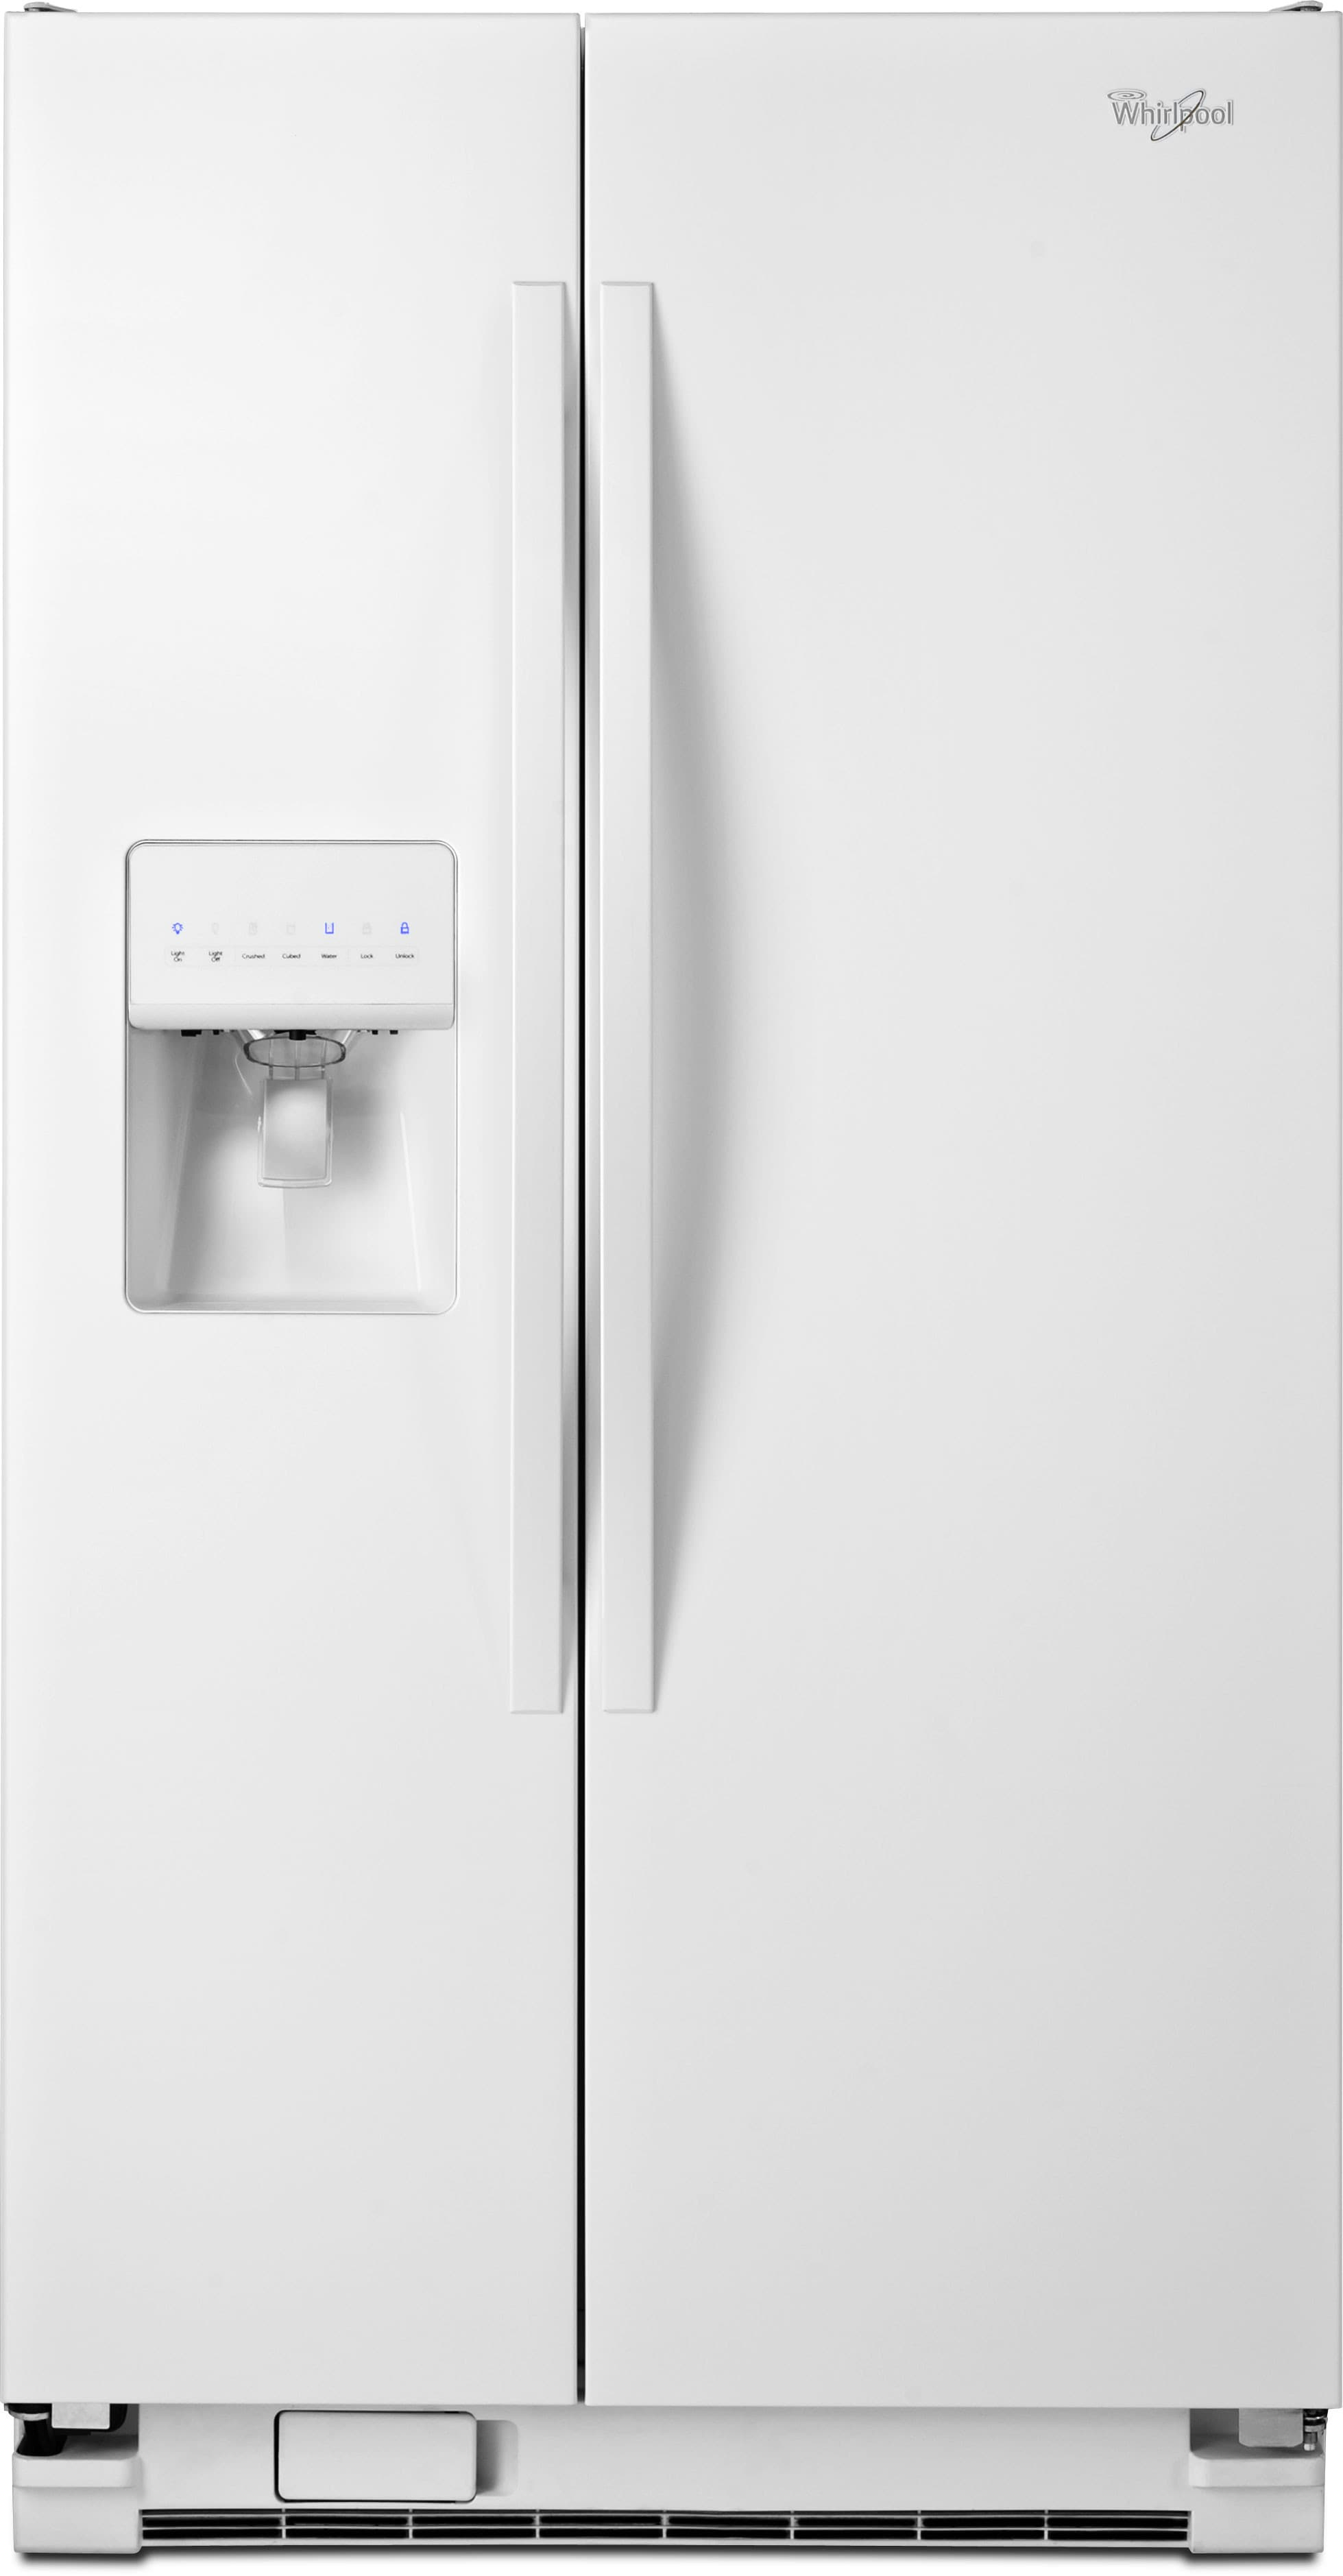 Whirlpool Wrs325fdaw 36 Inch Side By Side Refrigerator